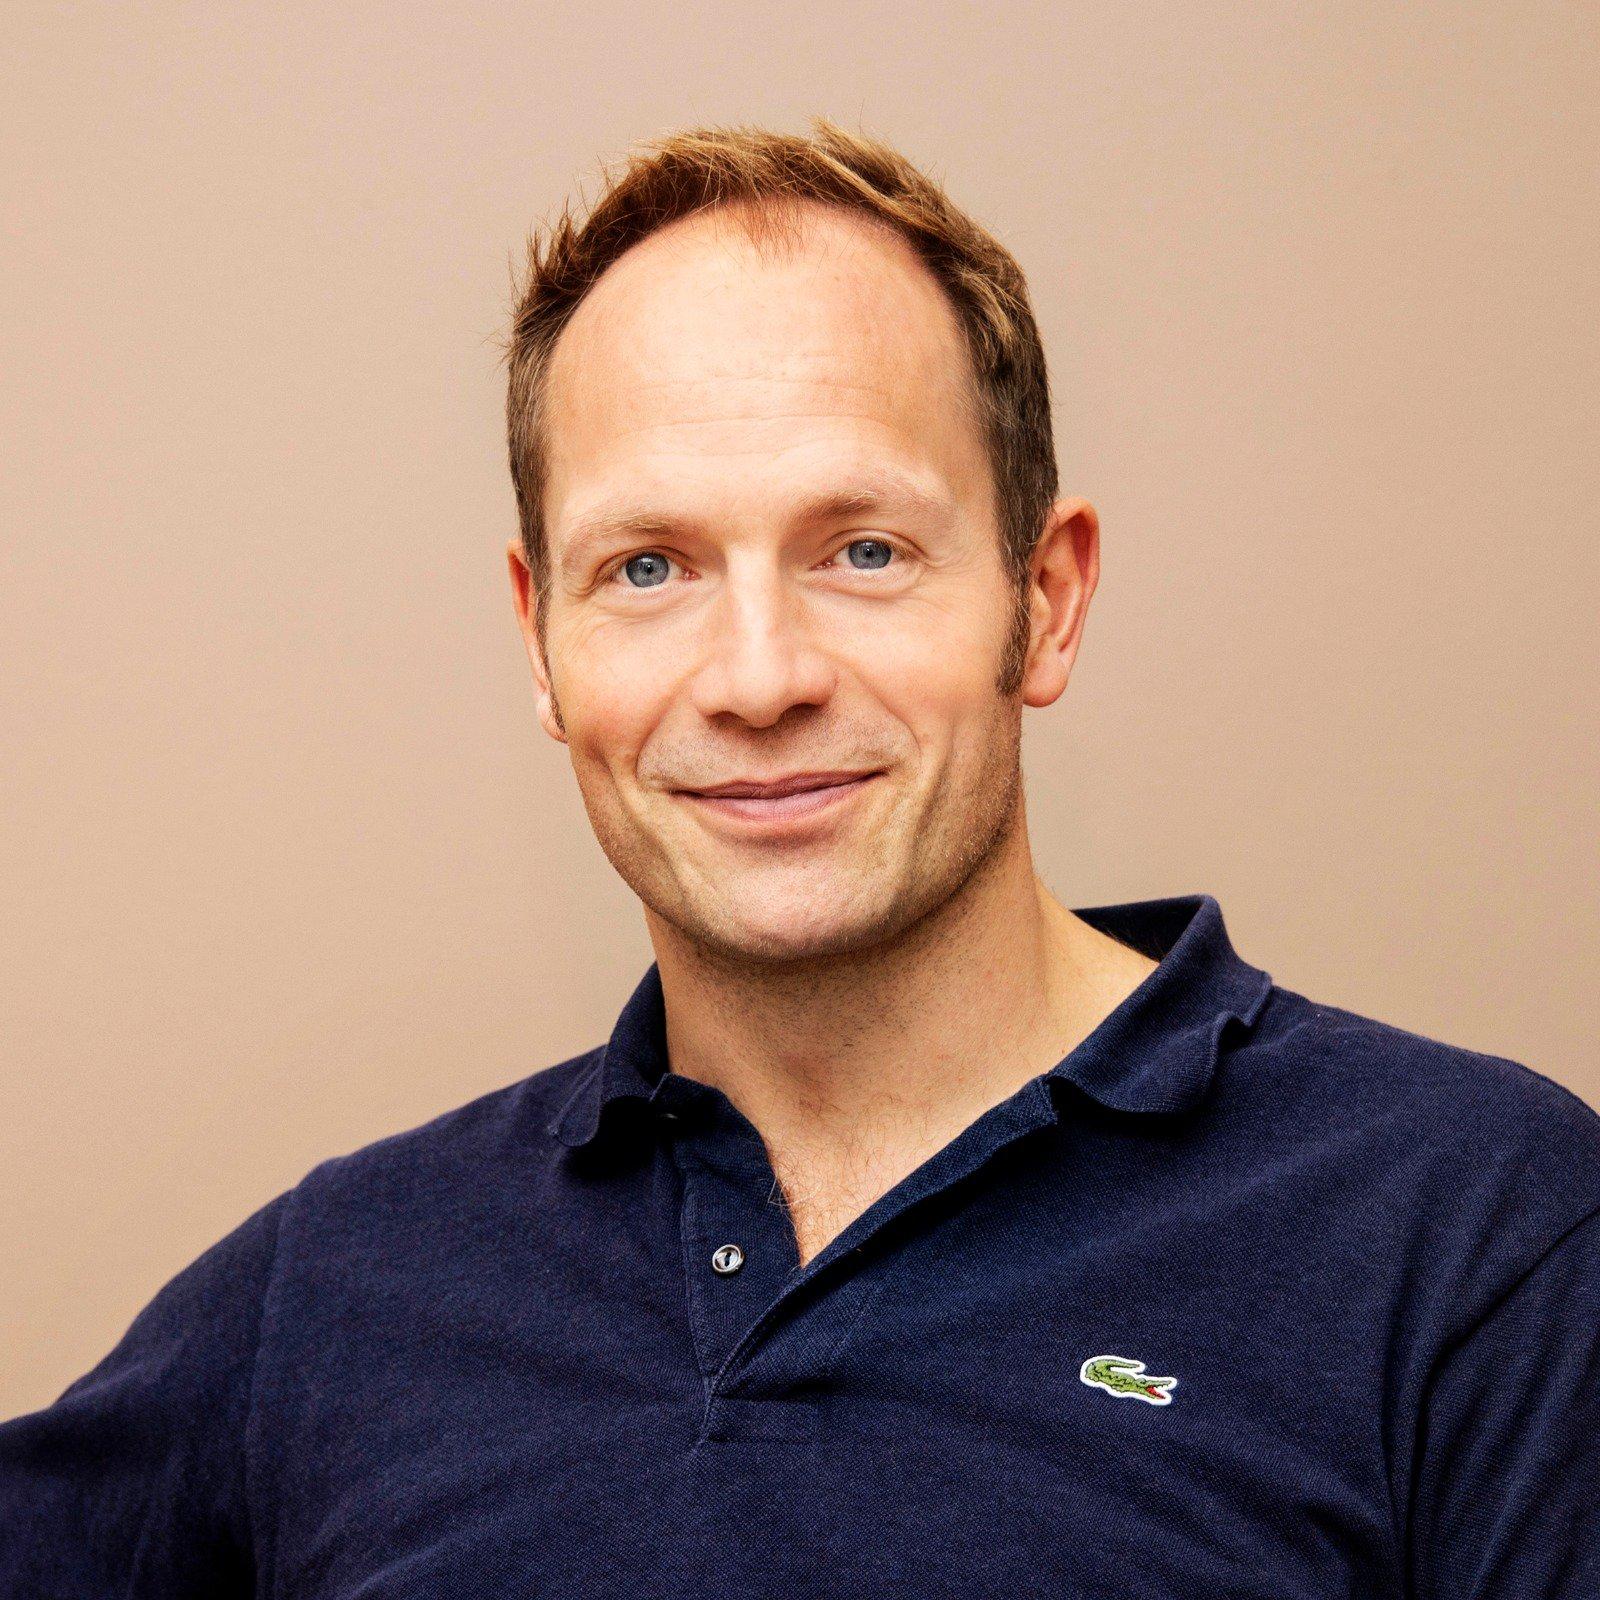 Kasper Hvidt, director of sports, Astralis. Photo: Astralis